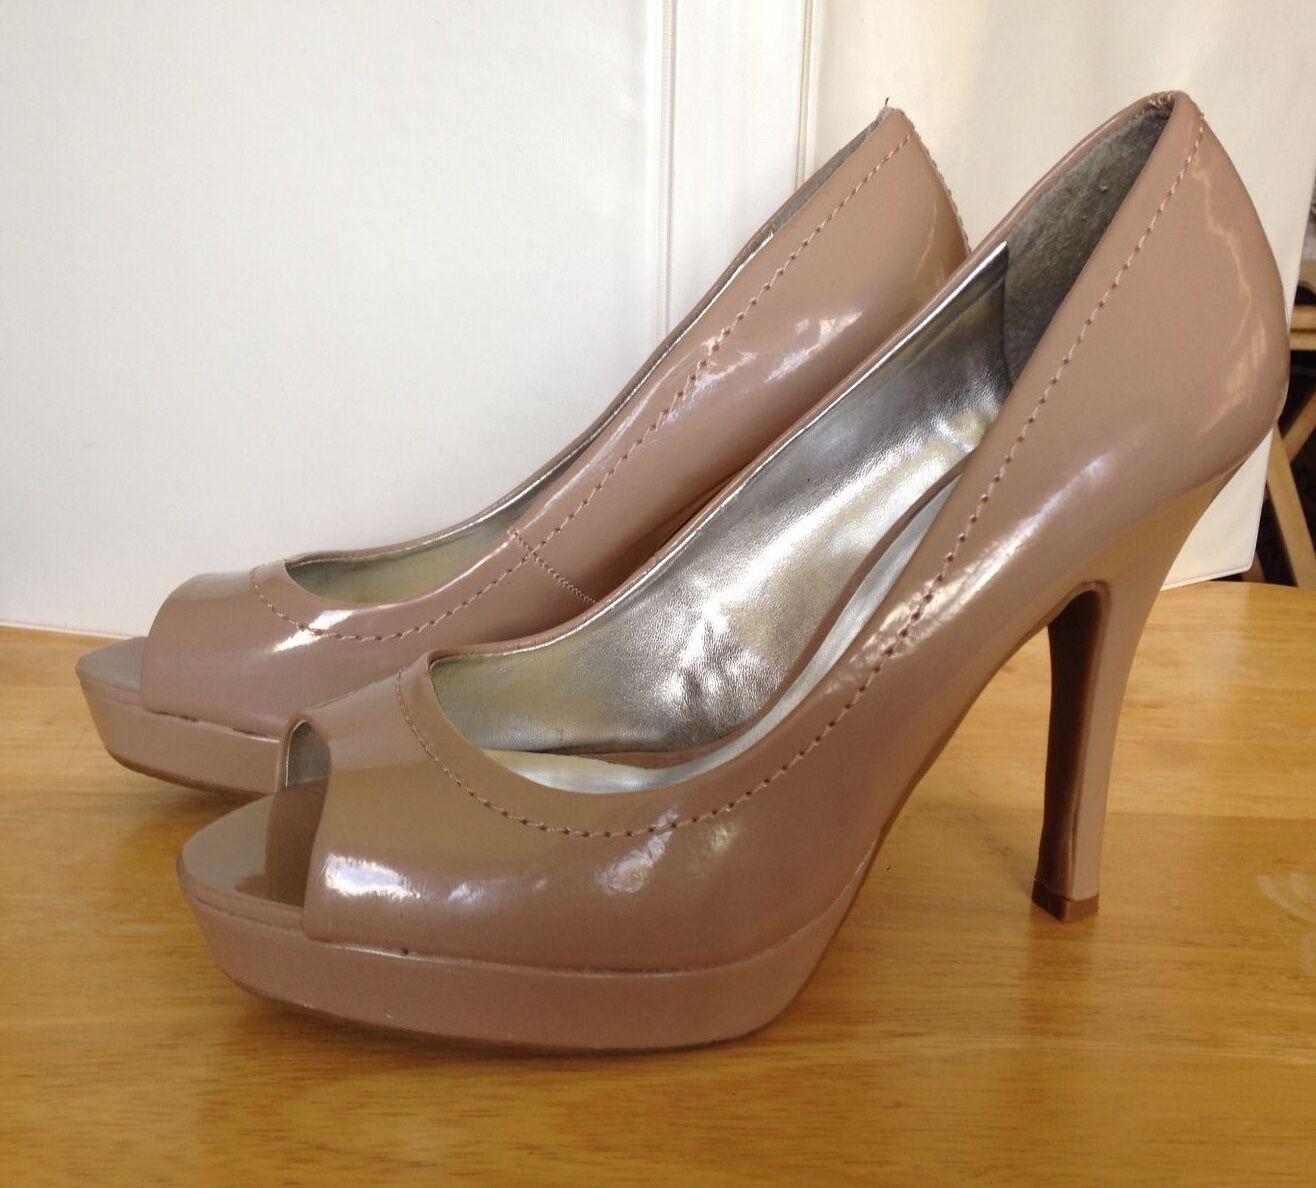 Women's CANDIES Tan Open Peep Shoes Toe High Heel Platform Shoes Peep Sz 9 Medium 4.5